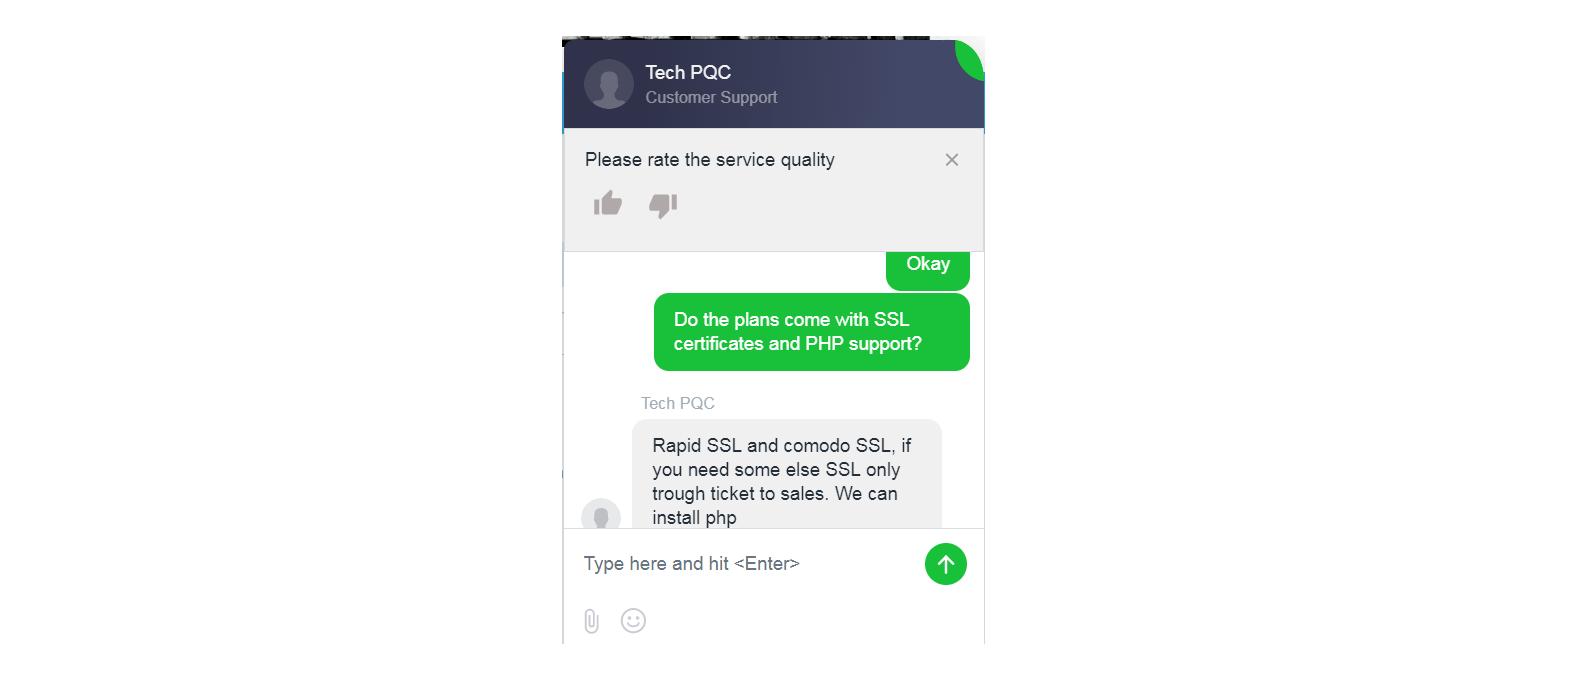 PQC Service